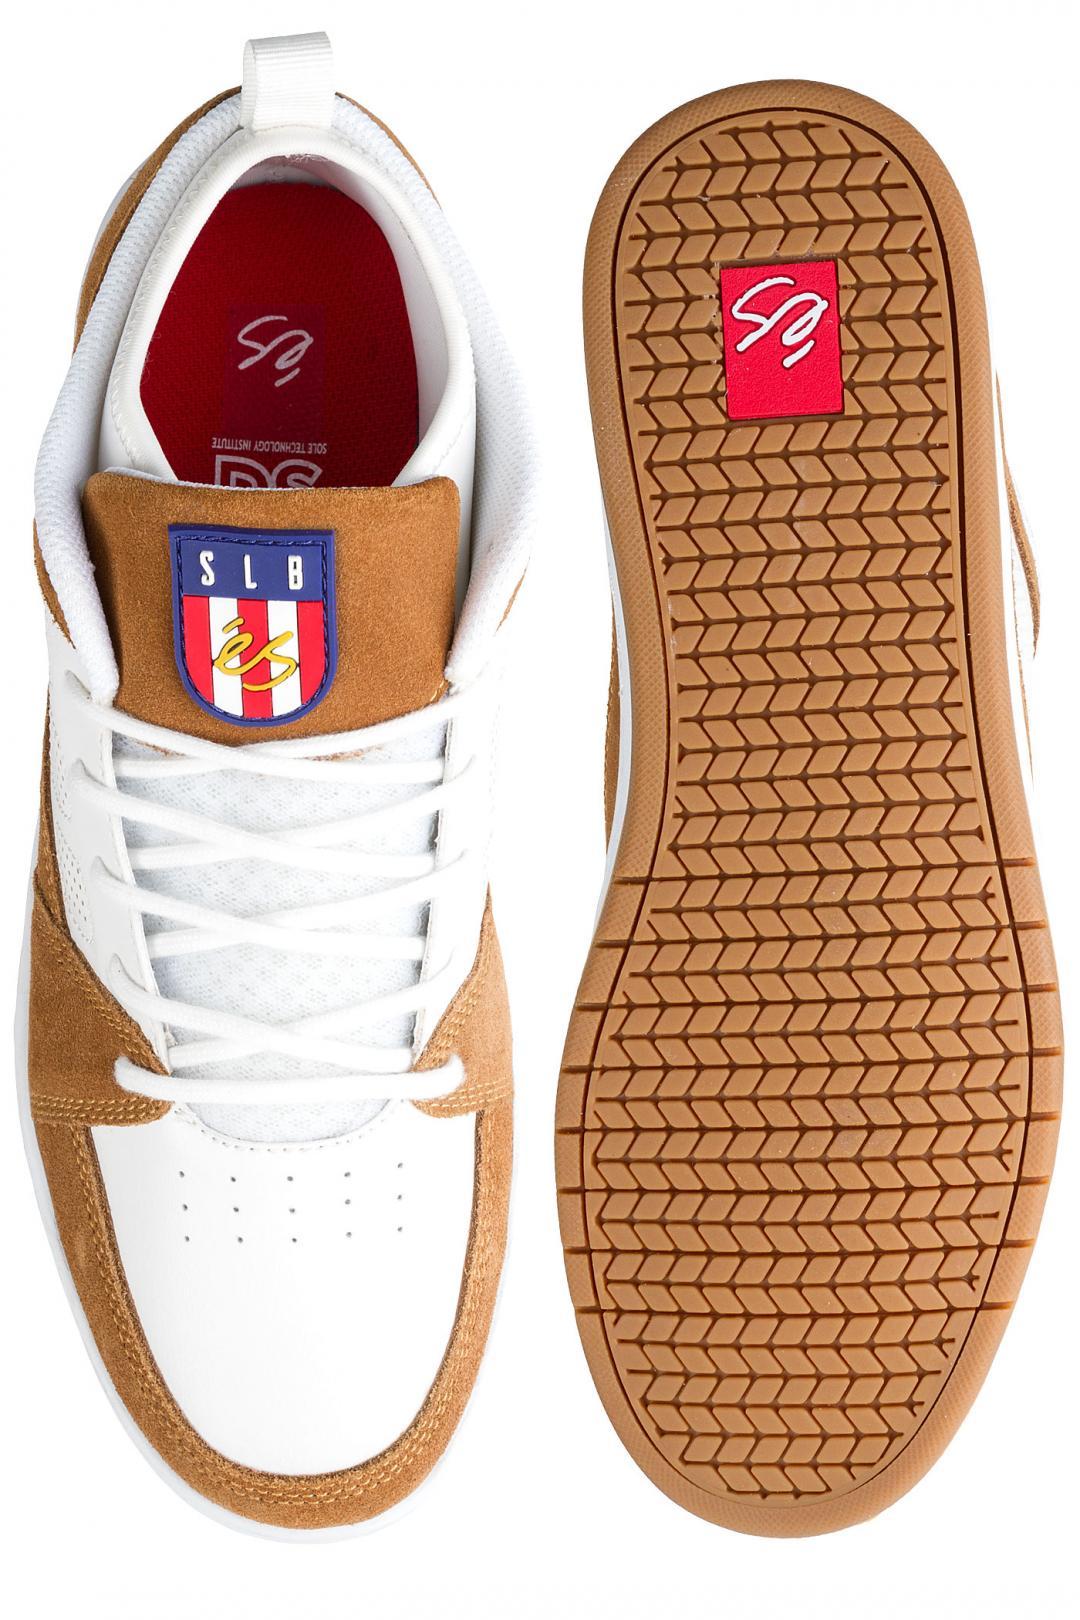 Uomo éS SLB Mid white tan   Sneaker